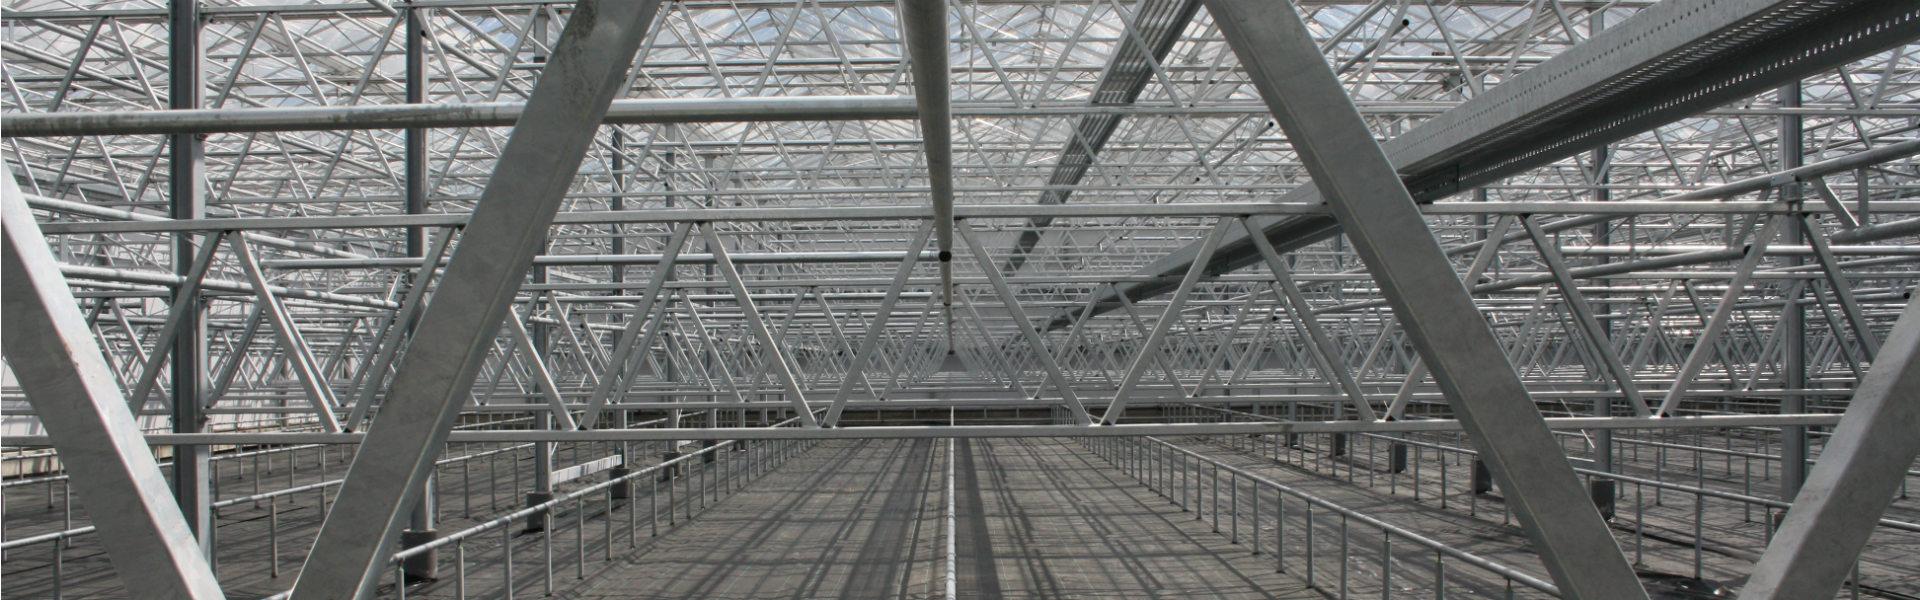 Steel greenhouse strucuture